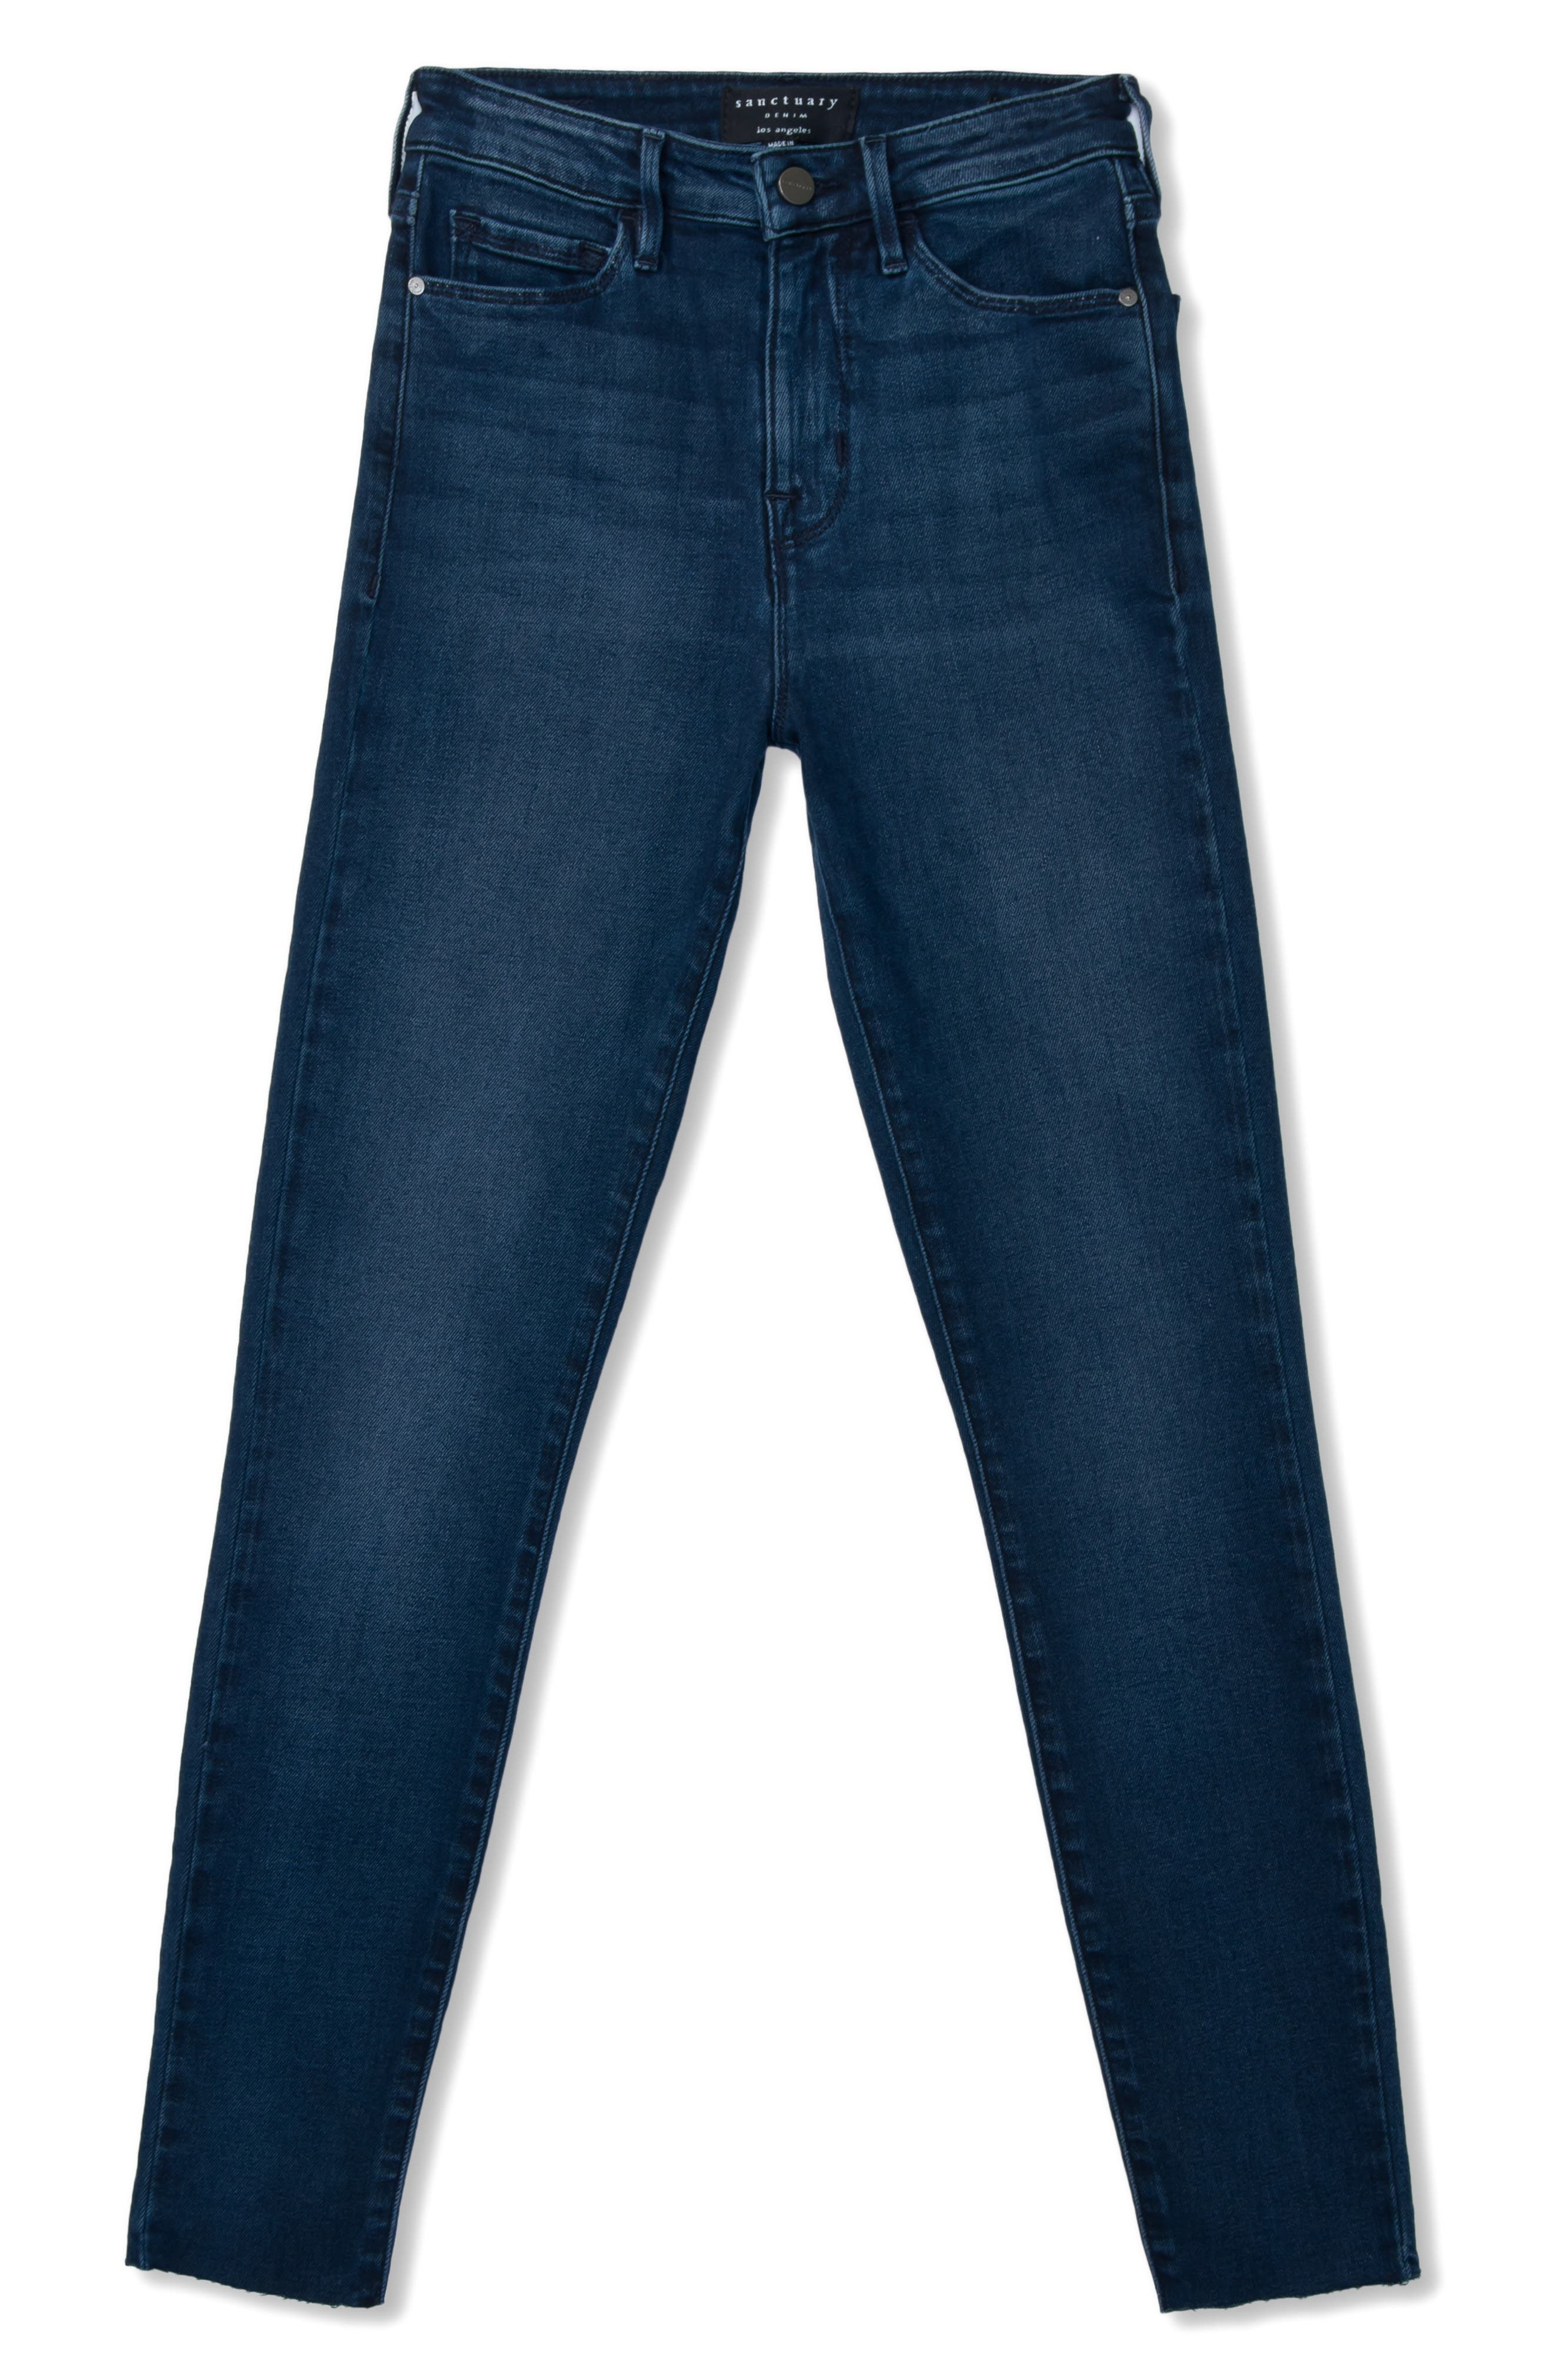 SANCTUARY,                             Social High Rise Raw Hem Skinny Ankle Jeans,                             Alternate thumbnail 4, color,                             401